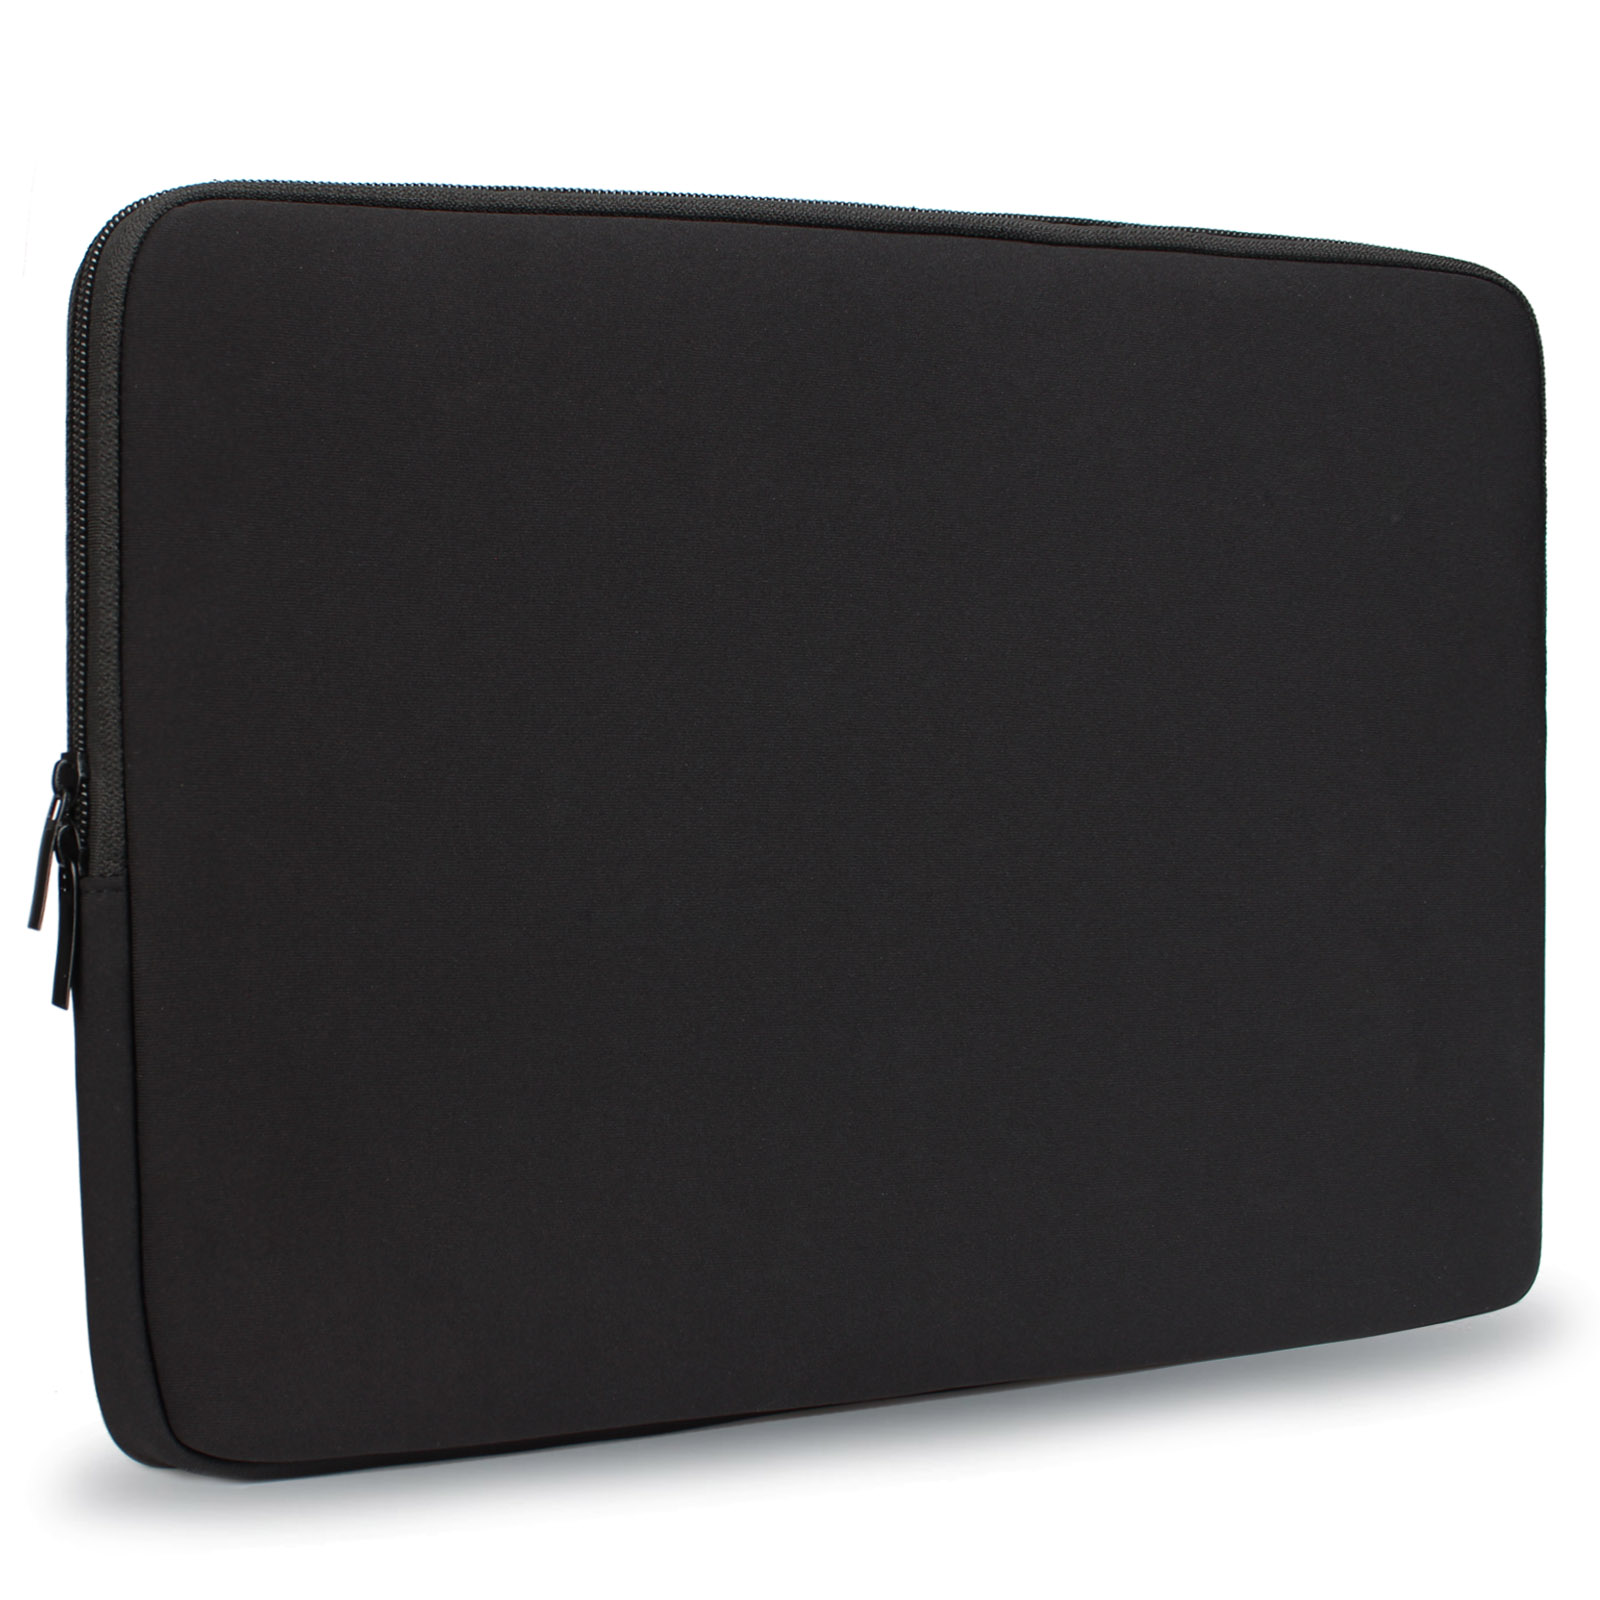 Waterproof Laptop Sleeve Case Carry Bag for MacBook Air 11 Pro Retina 13 15 inch